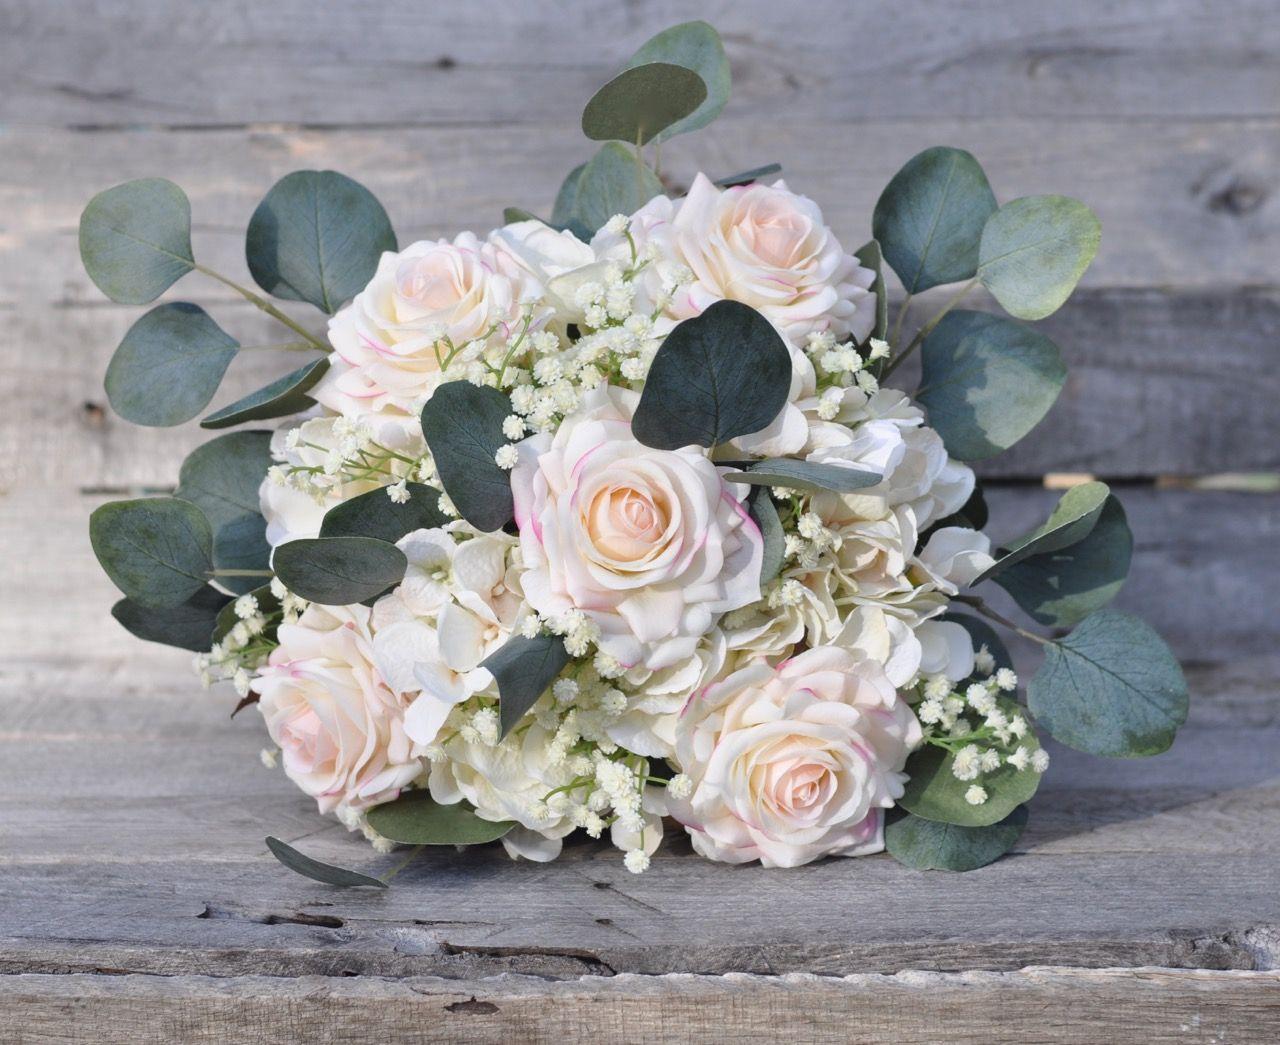 Keepsake real flower bouquet shipping worldwide from Holly\'s Flower ...